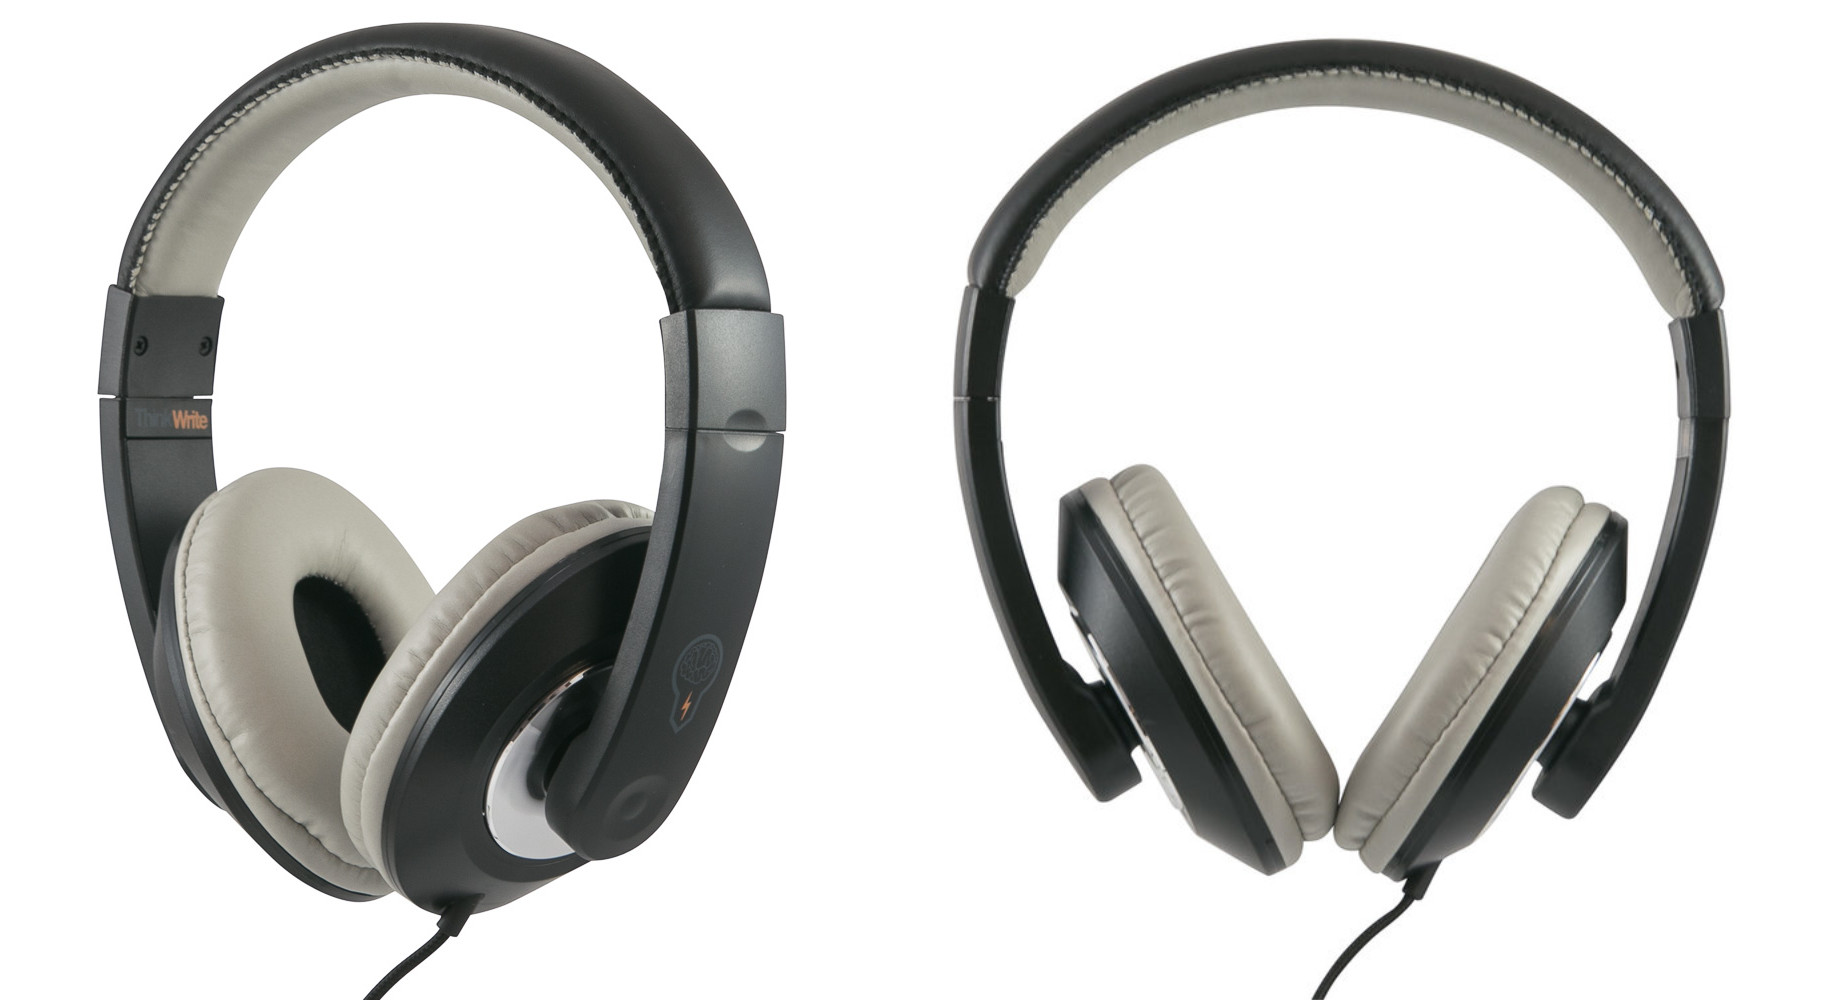 ThinkWriteOLD-Headphones.jpg